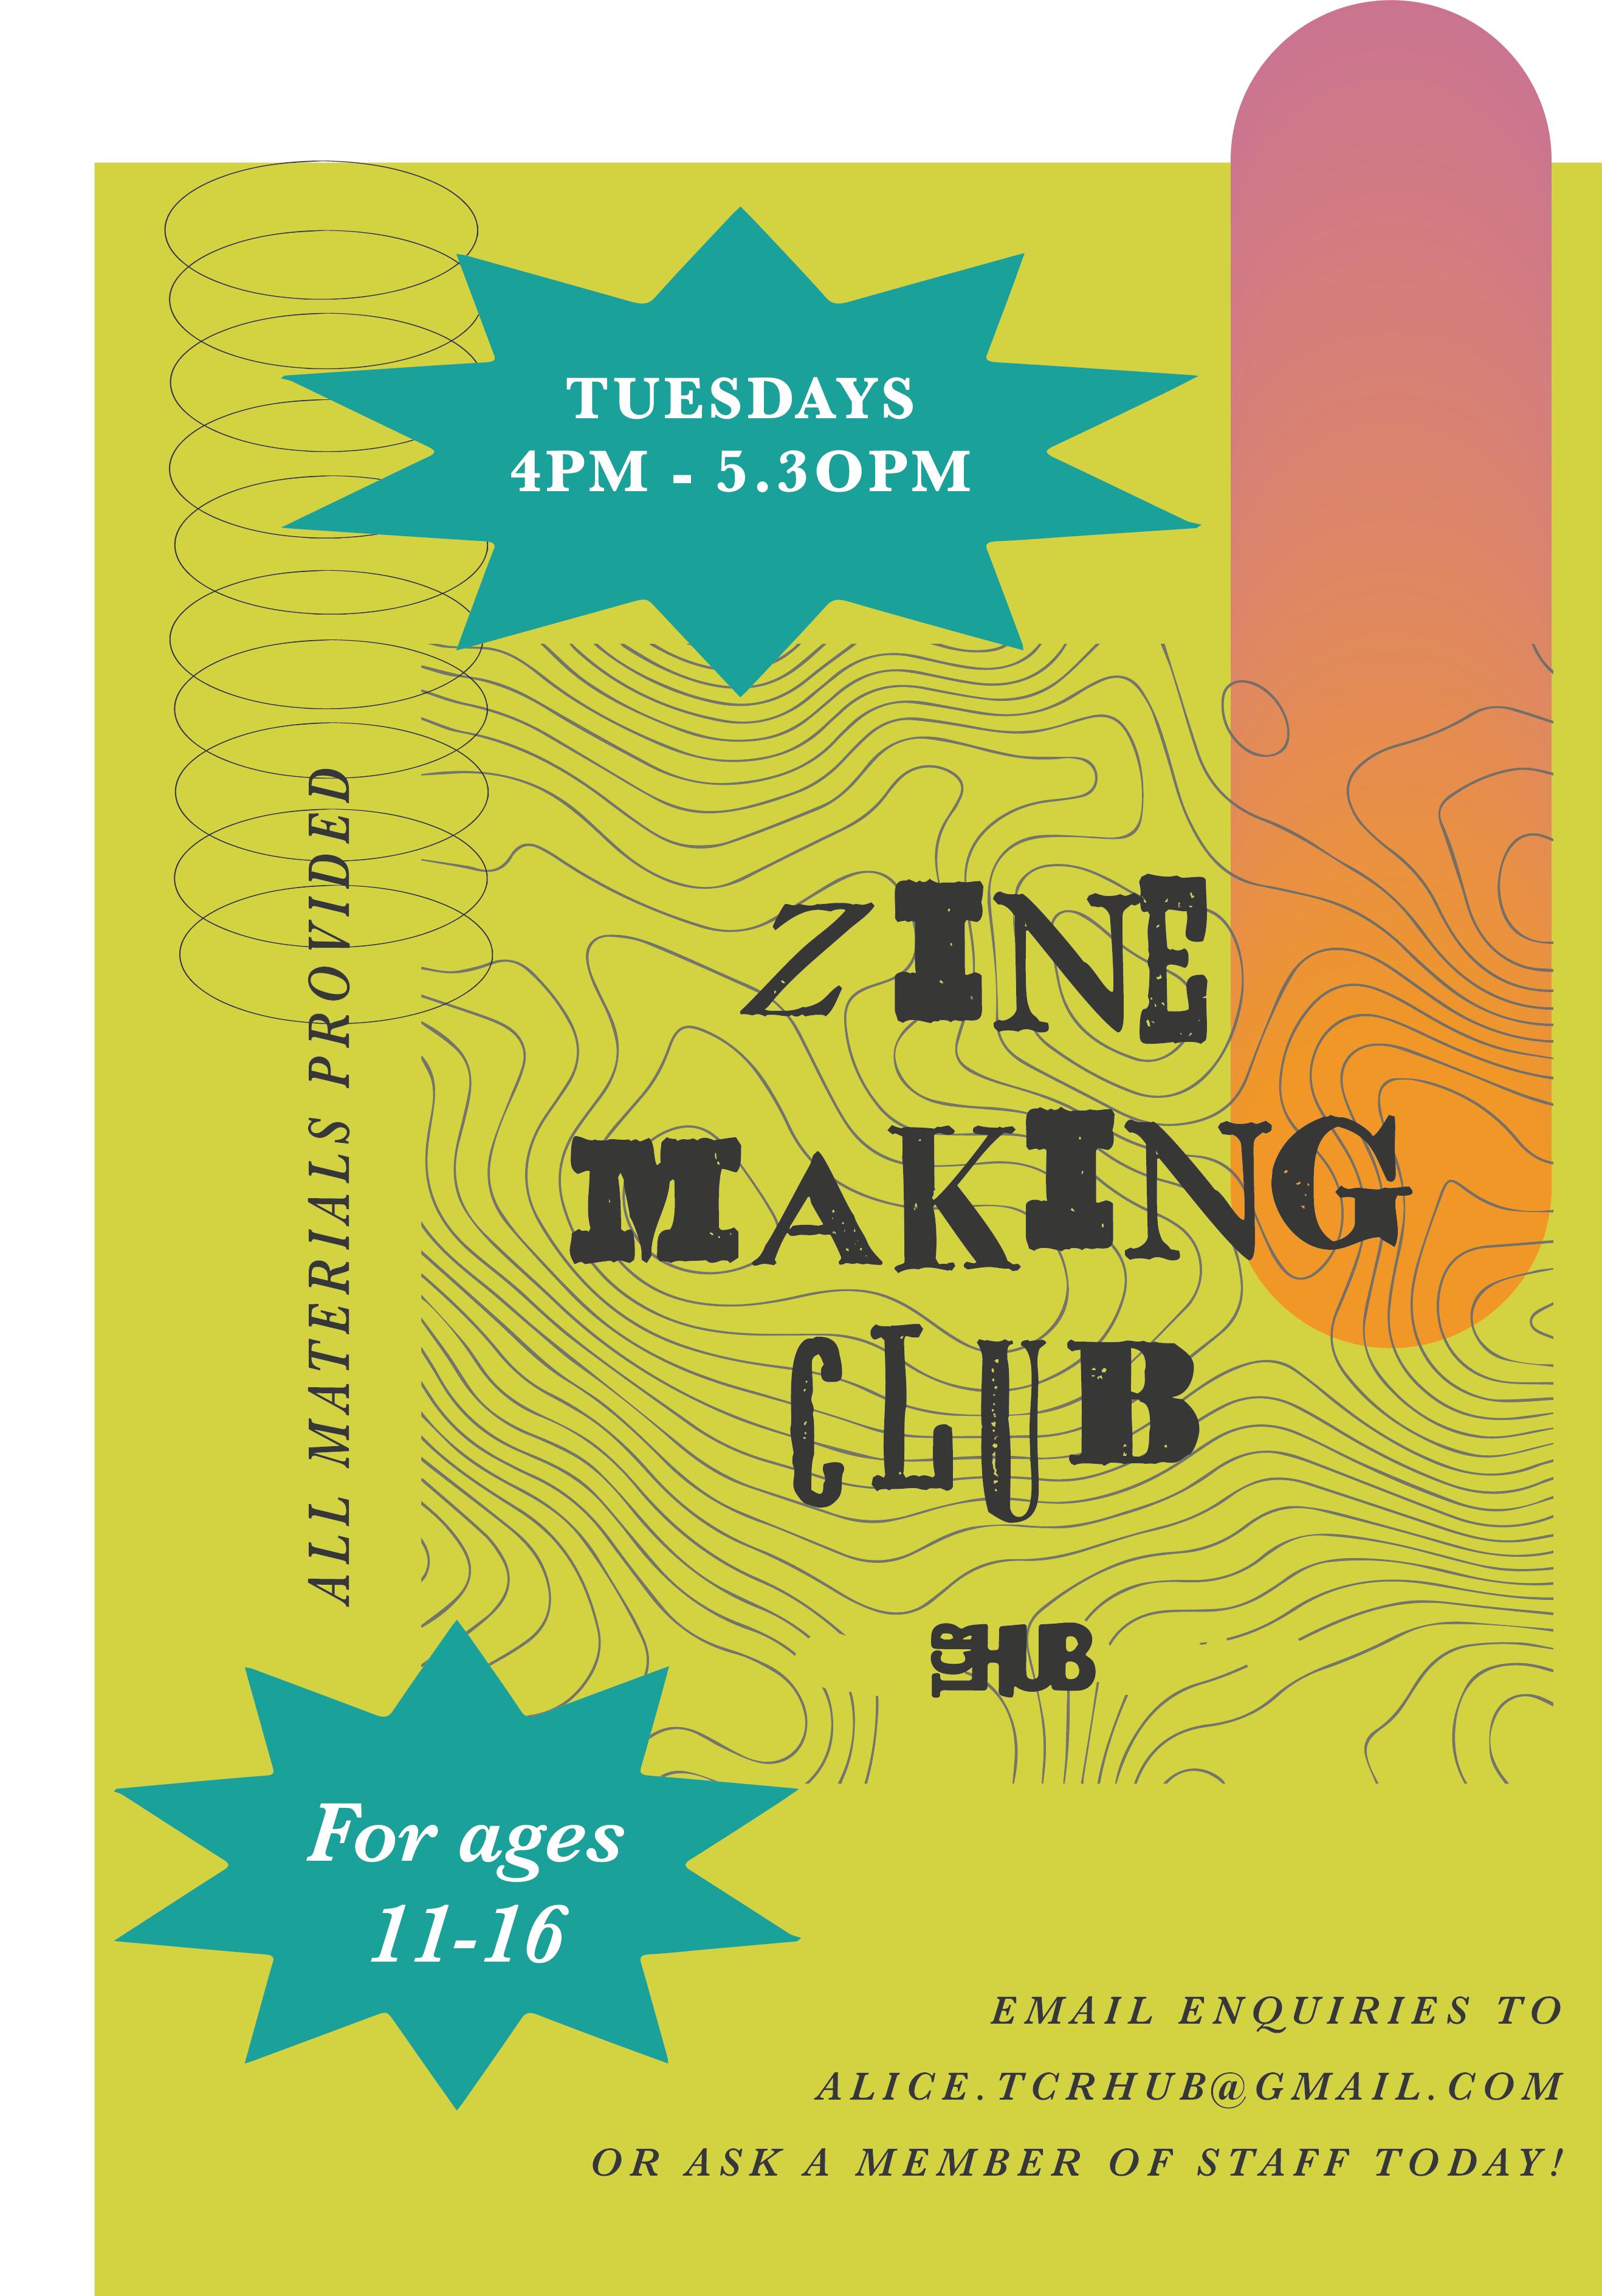 Zine making club poster